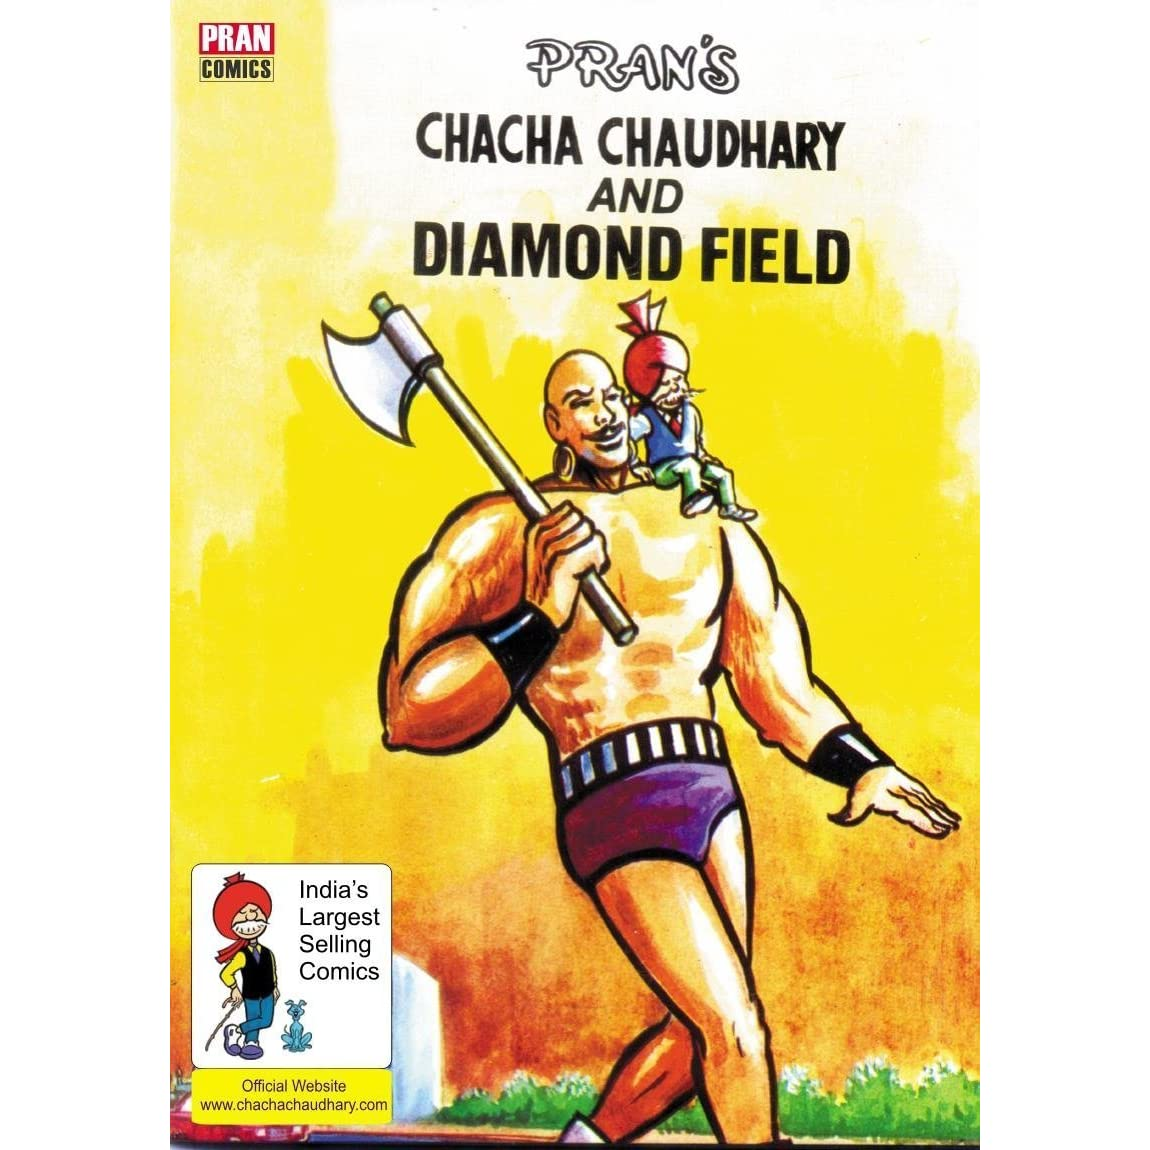 CHACHA CHAUDHARY AND DIAMOND FIELD: CHACHA CHAUDHARY by Pran Kumar